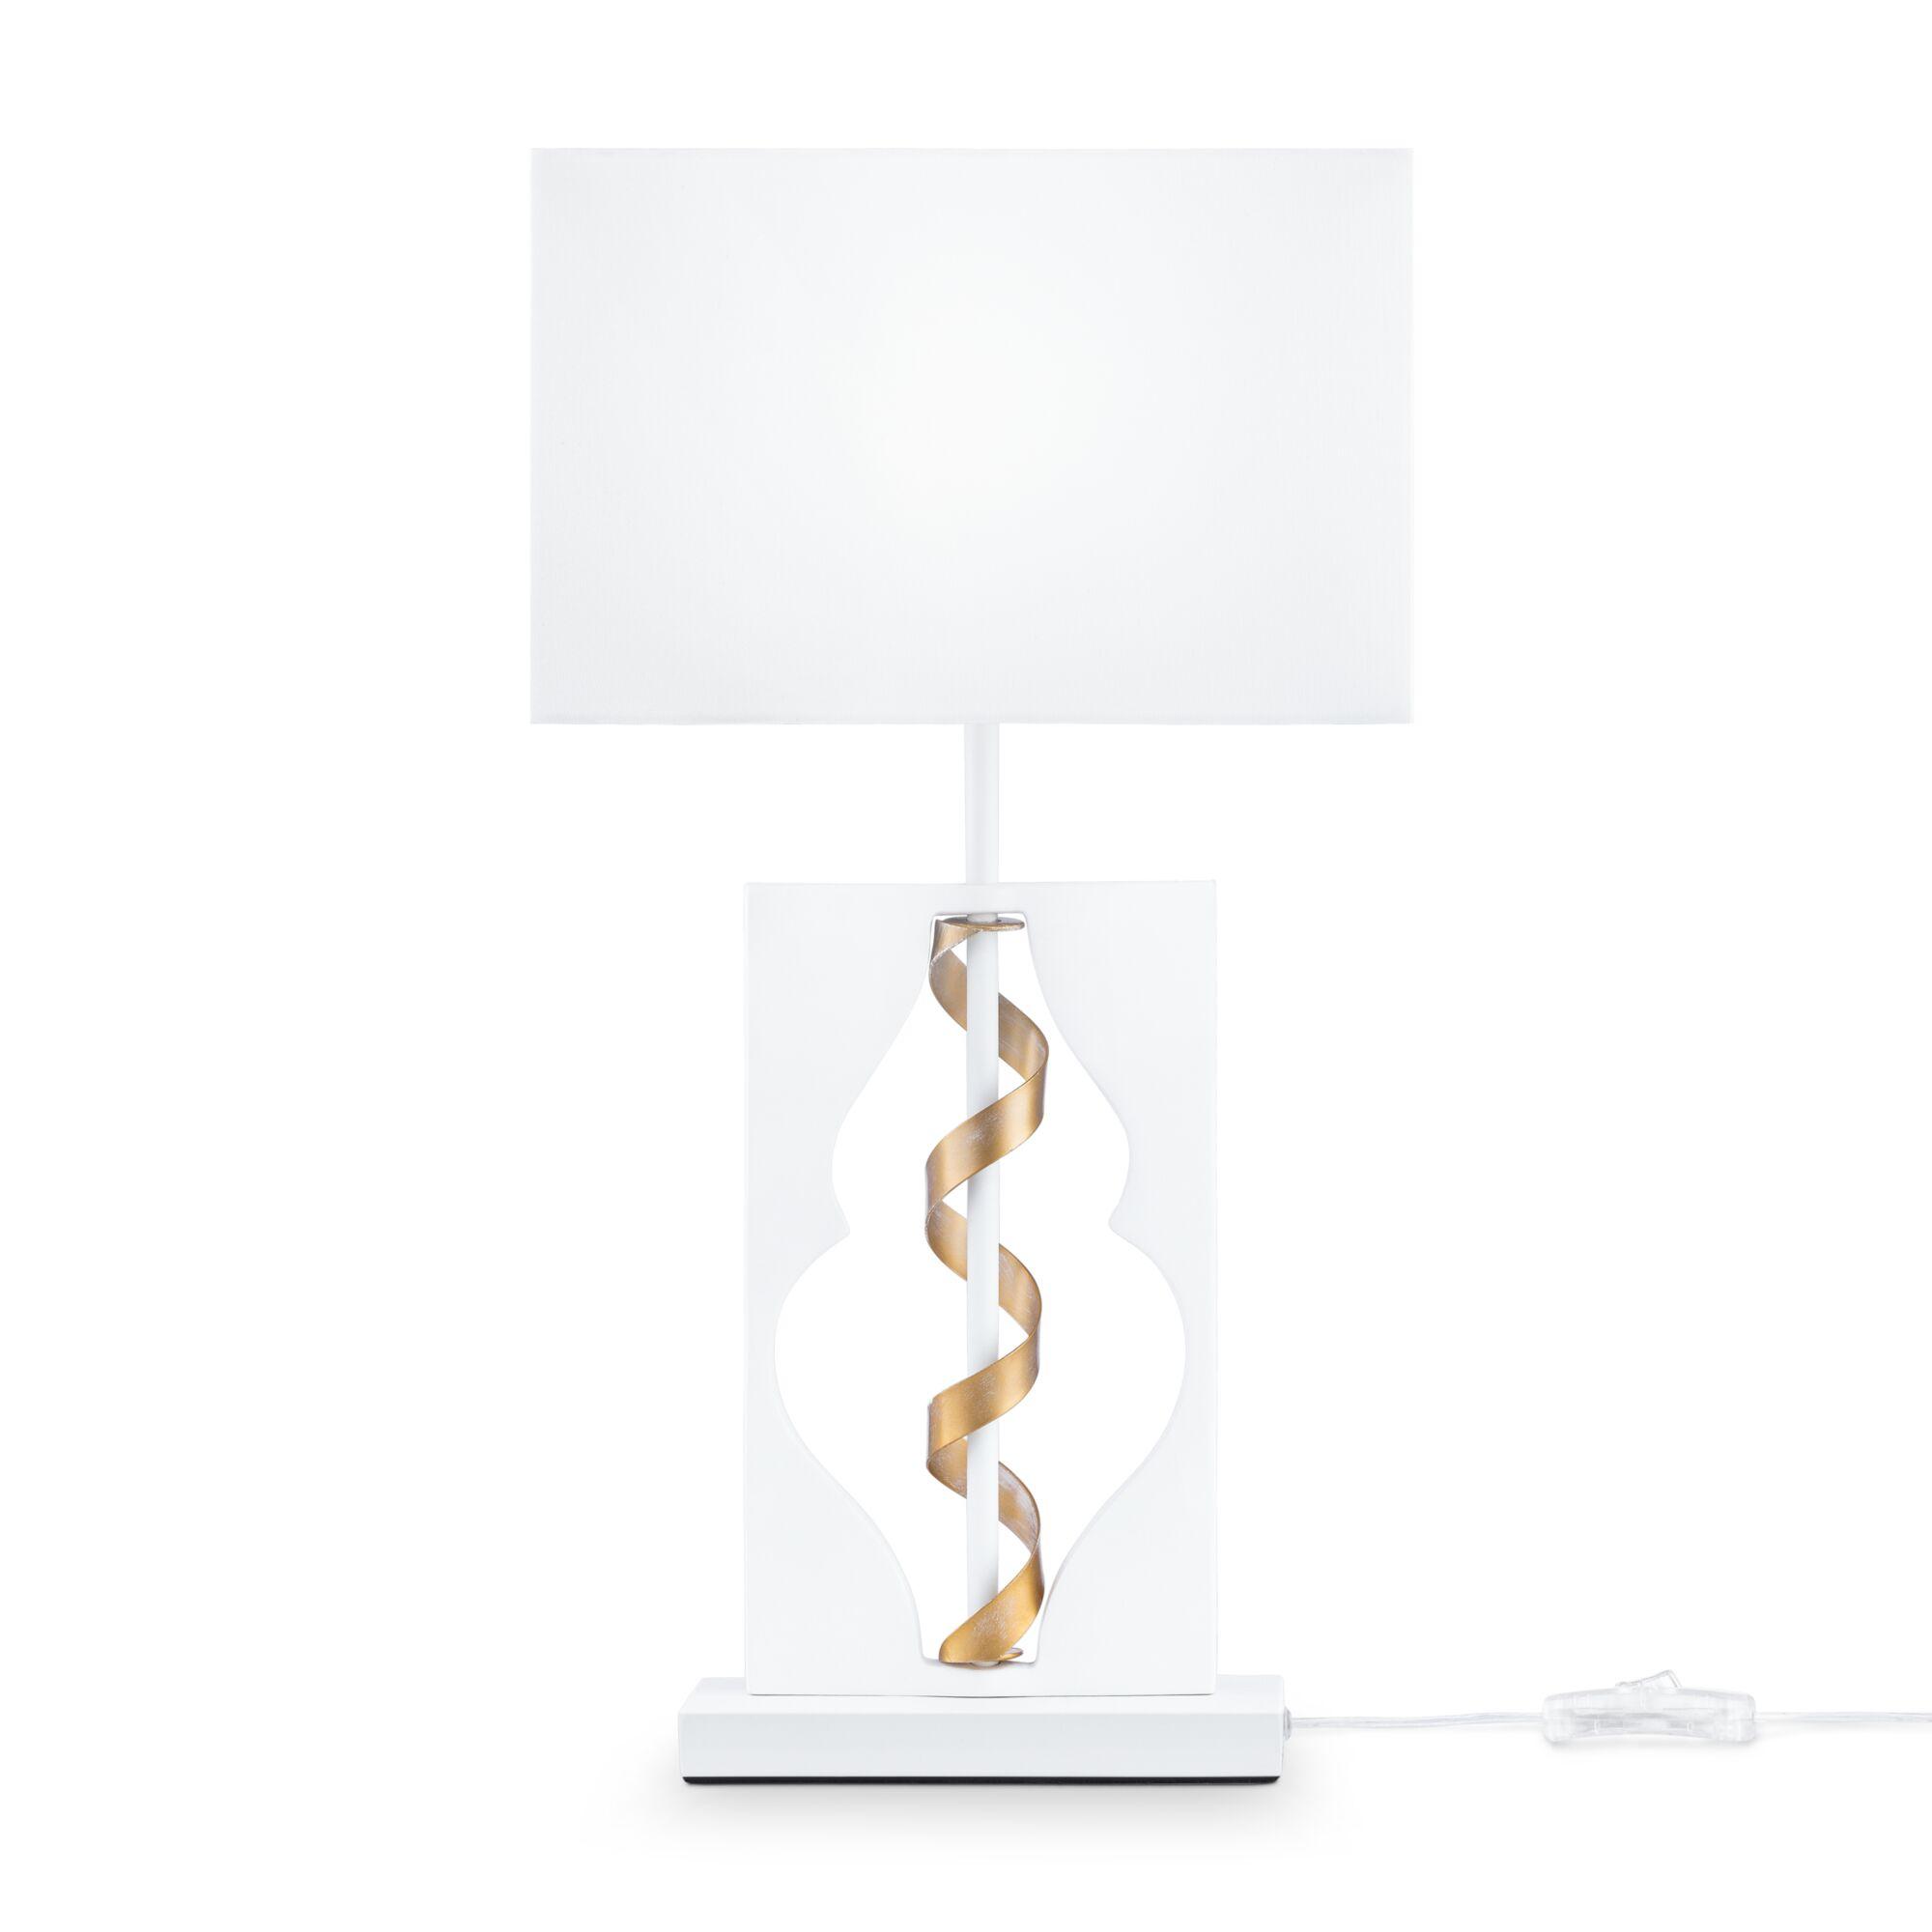 Настольная лампа Maytoni ARM010-11-W Белый с Золотом 1хE14х40W настольная лампа eurosvet 01002 1 белый с золотом